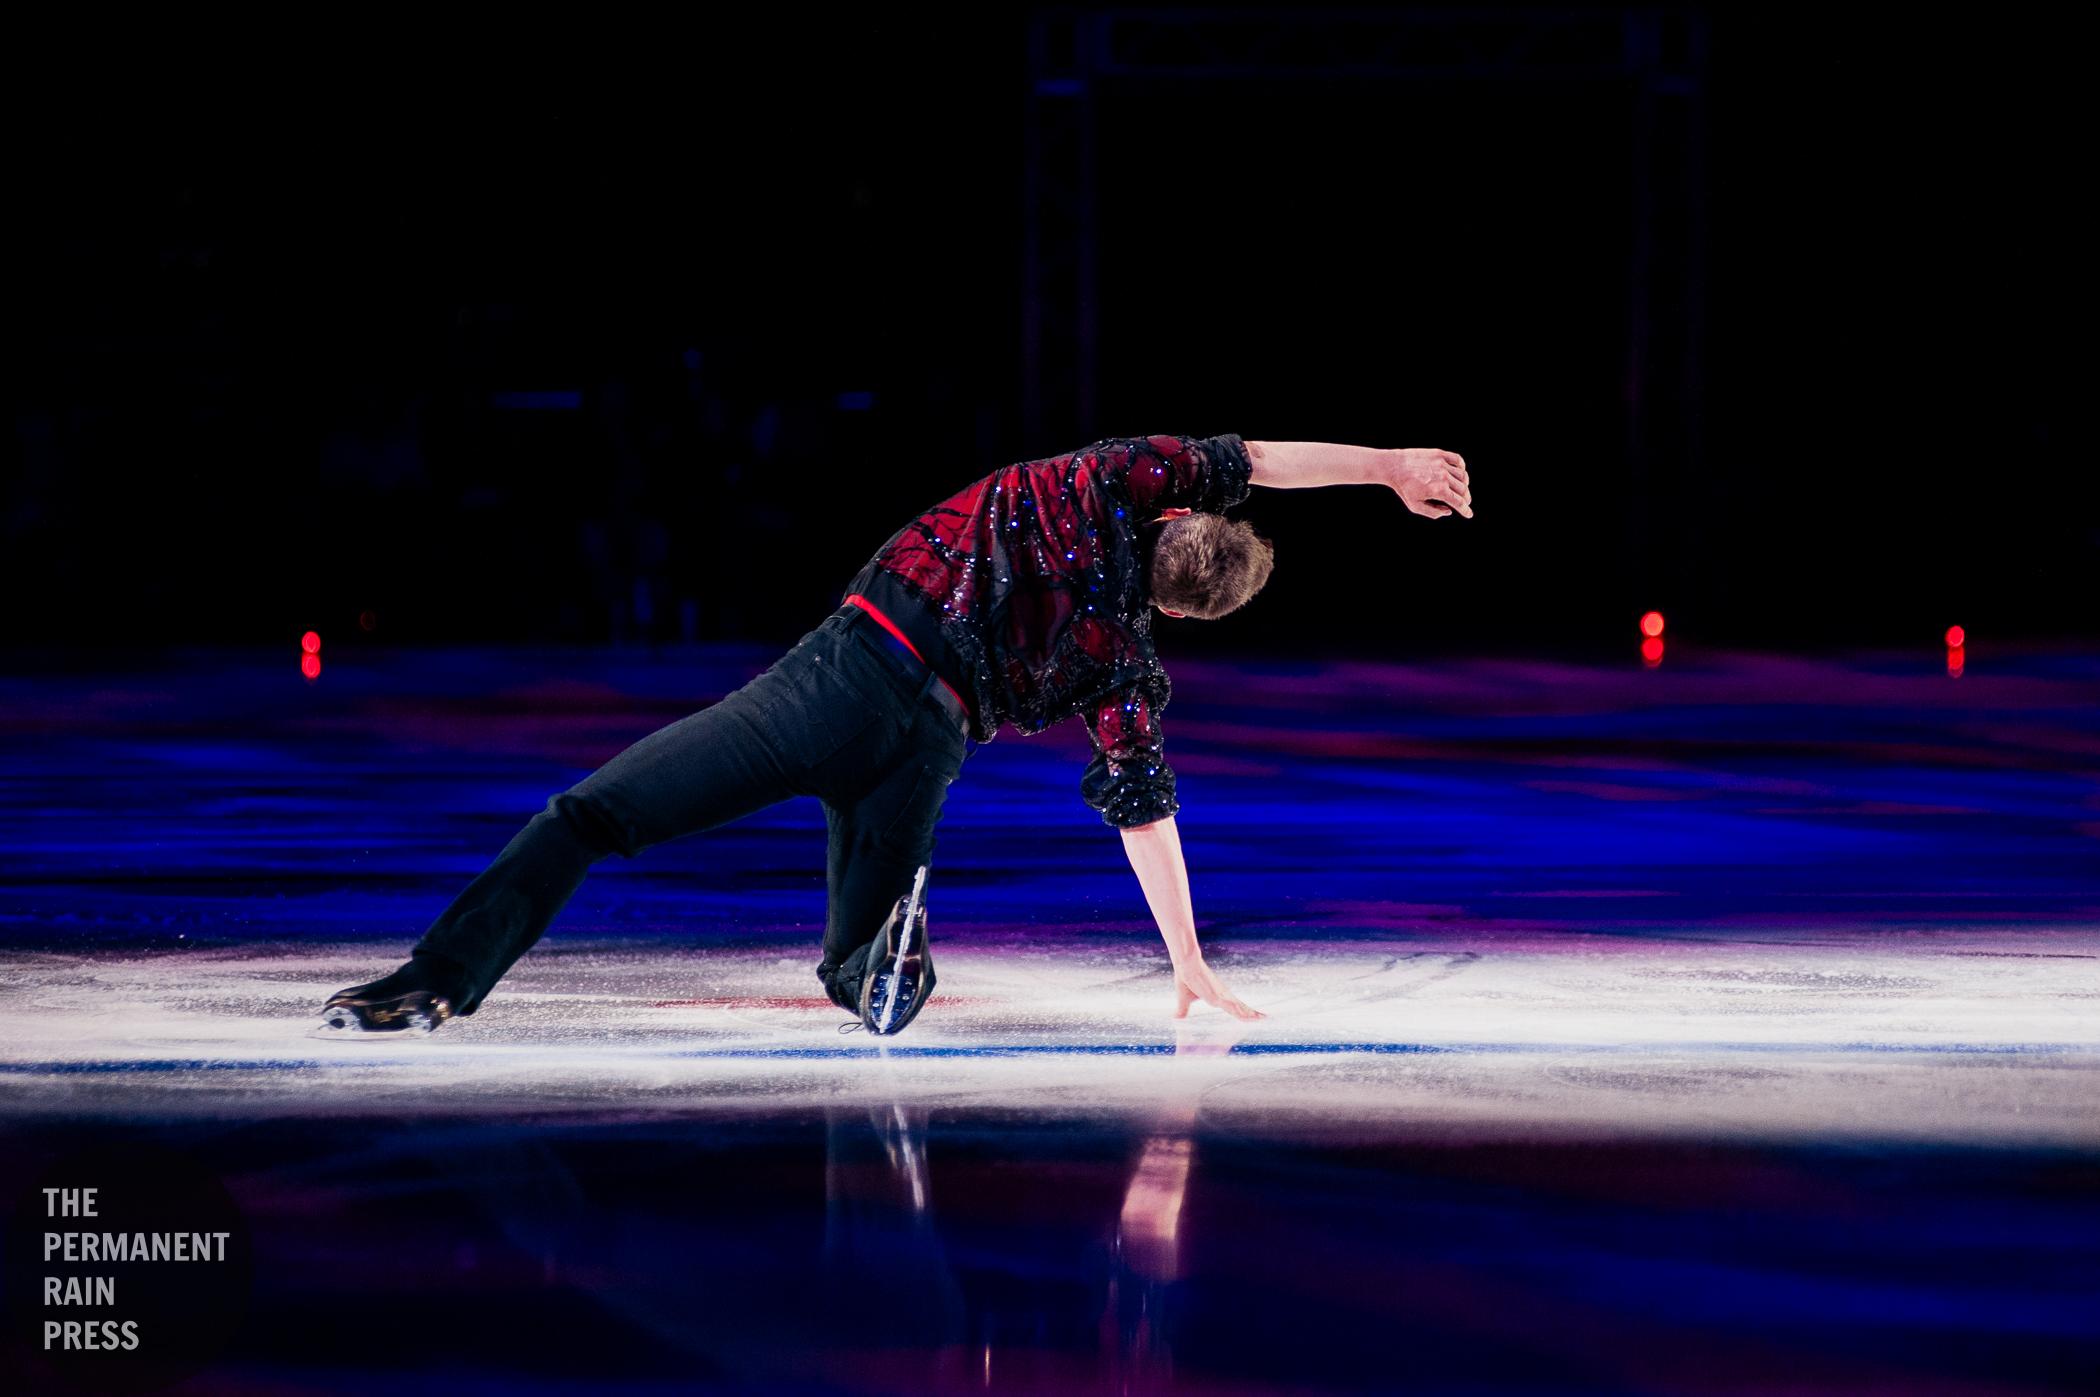 Stars_On_Ice-Rogers-Arena_Timothy_Nguyen-10.jpg